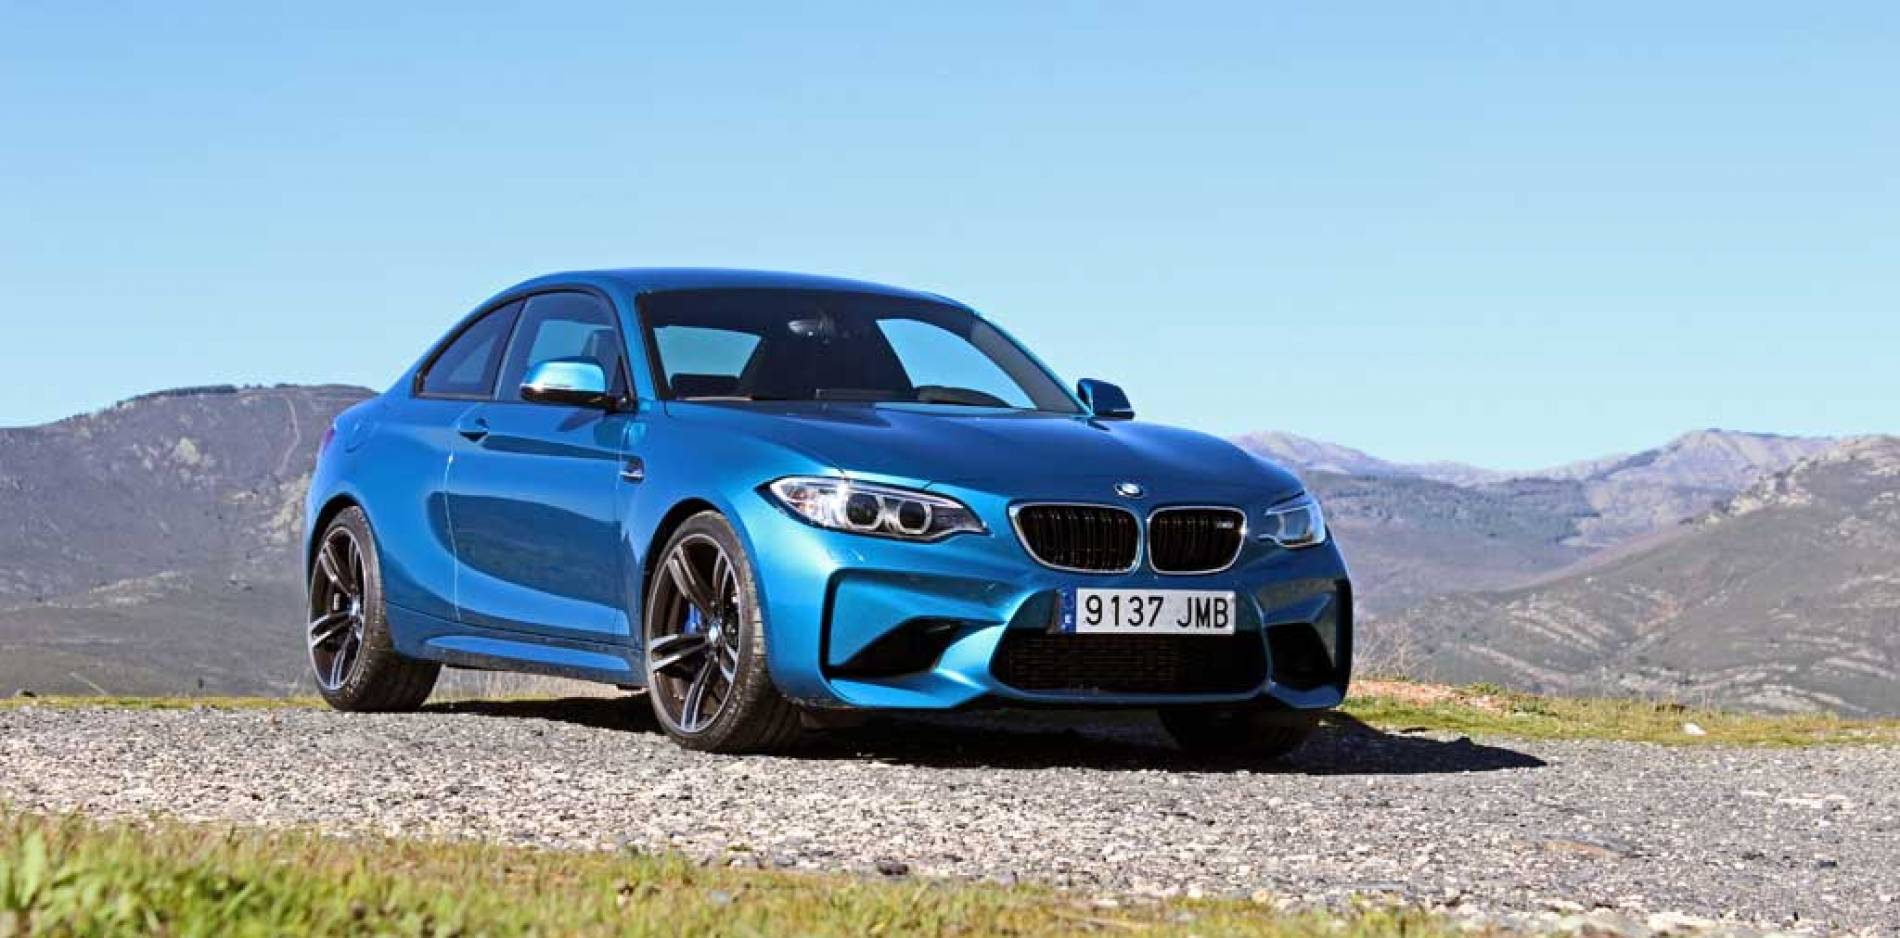 Prueba BMW M2 Coupé DKG, un trabajo excepcional